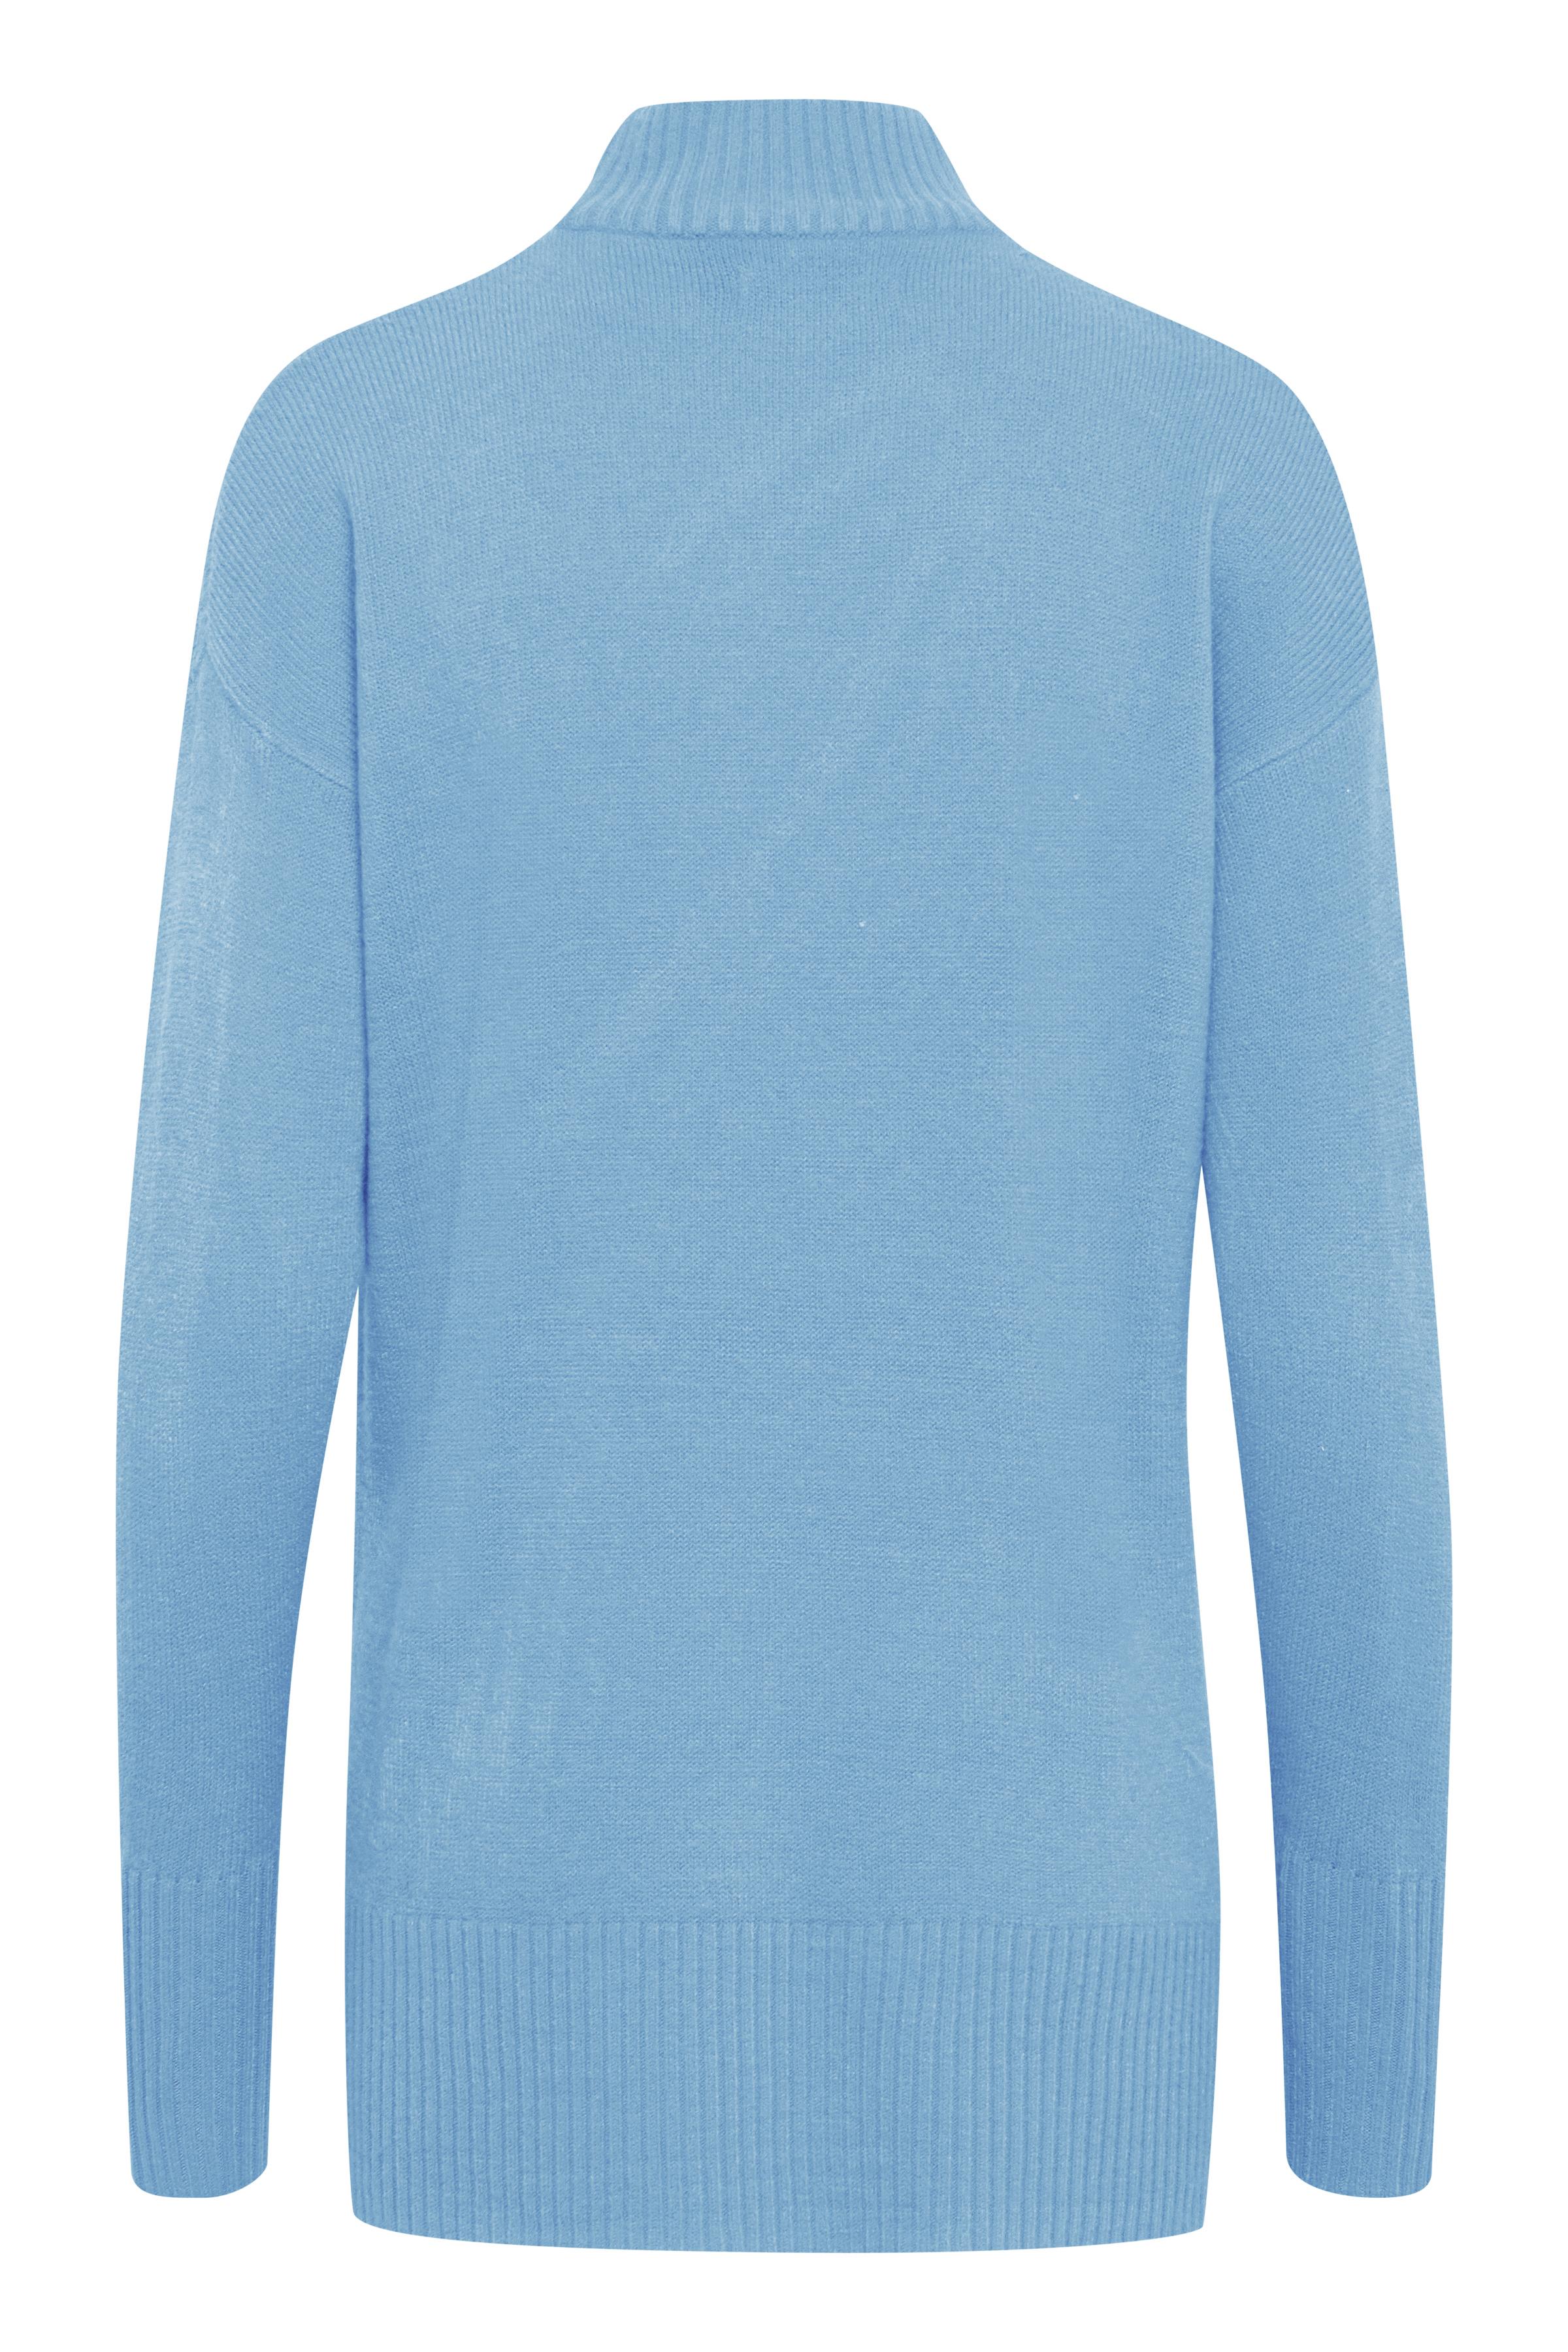 Cornflower Blue Pullover van b.young – Koop Cornflower Blue Pullover hier van size XS-XXL